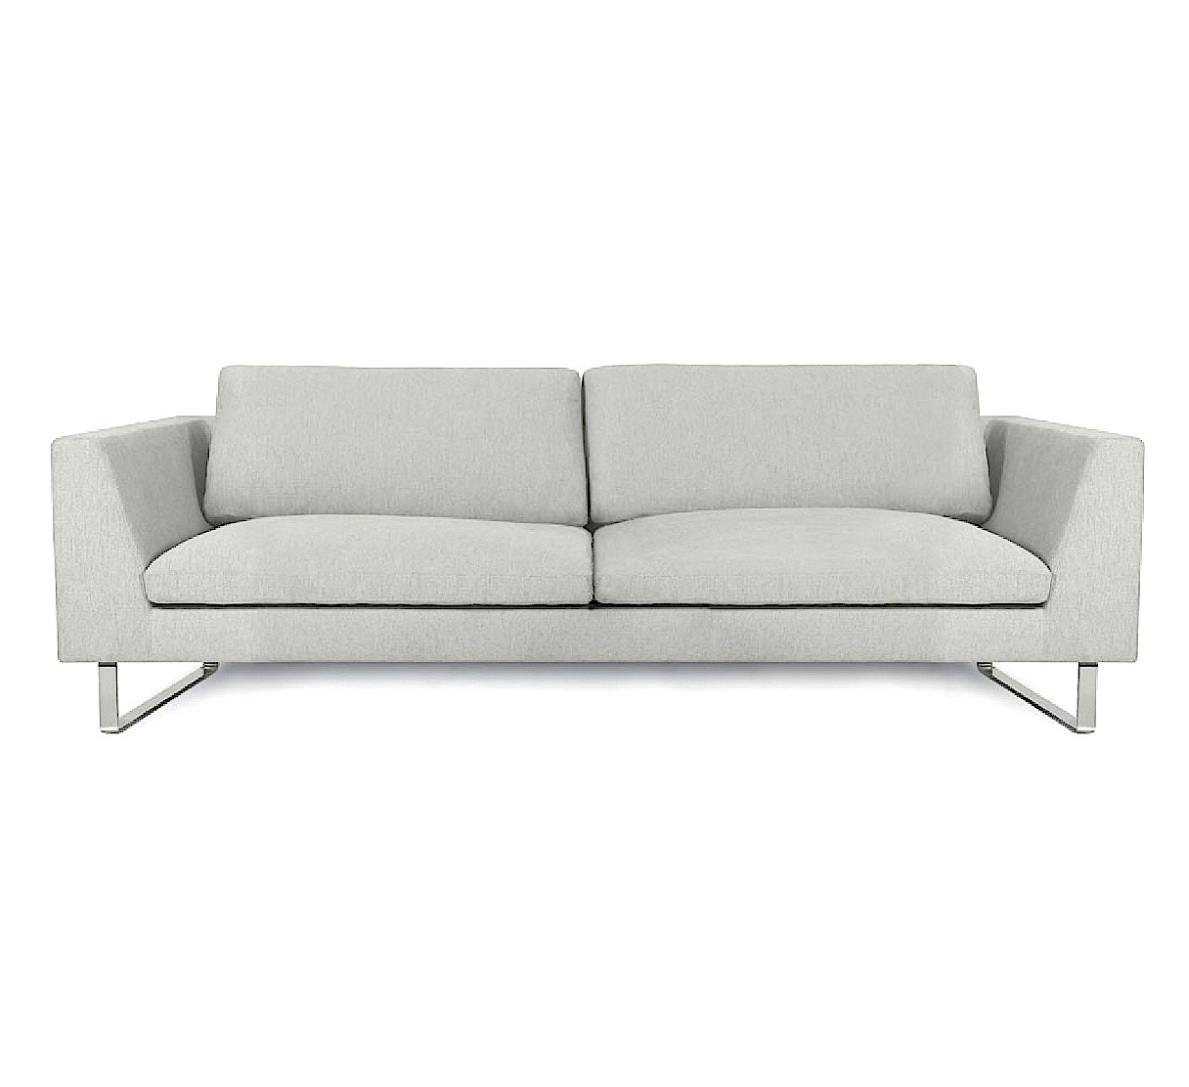 Osaka 3 Seater Sofa-0